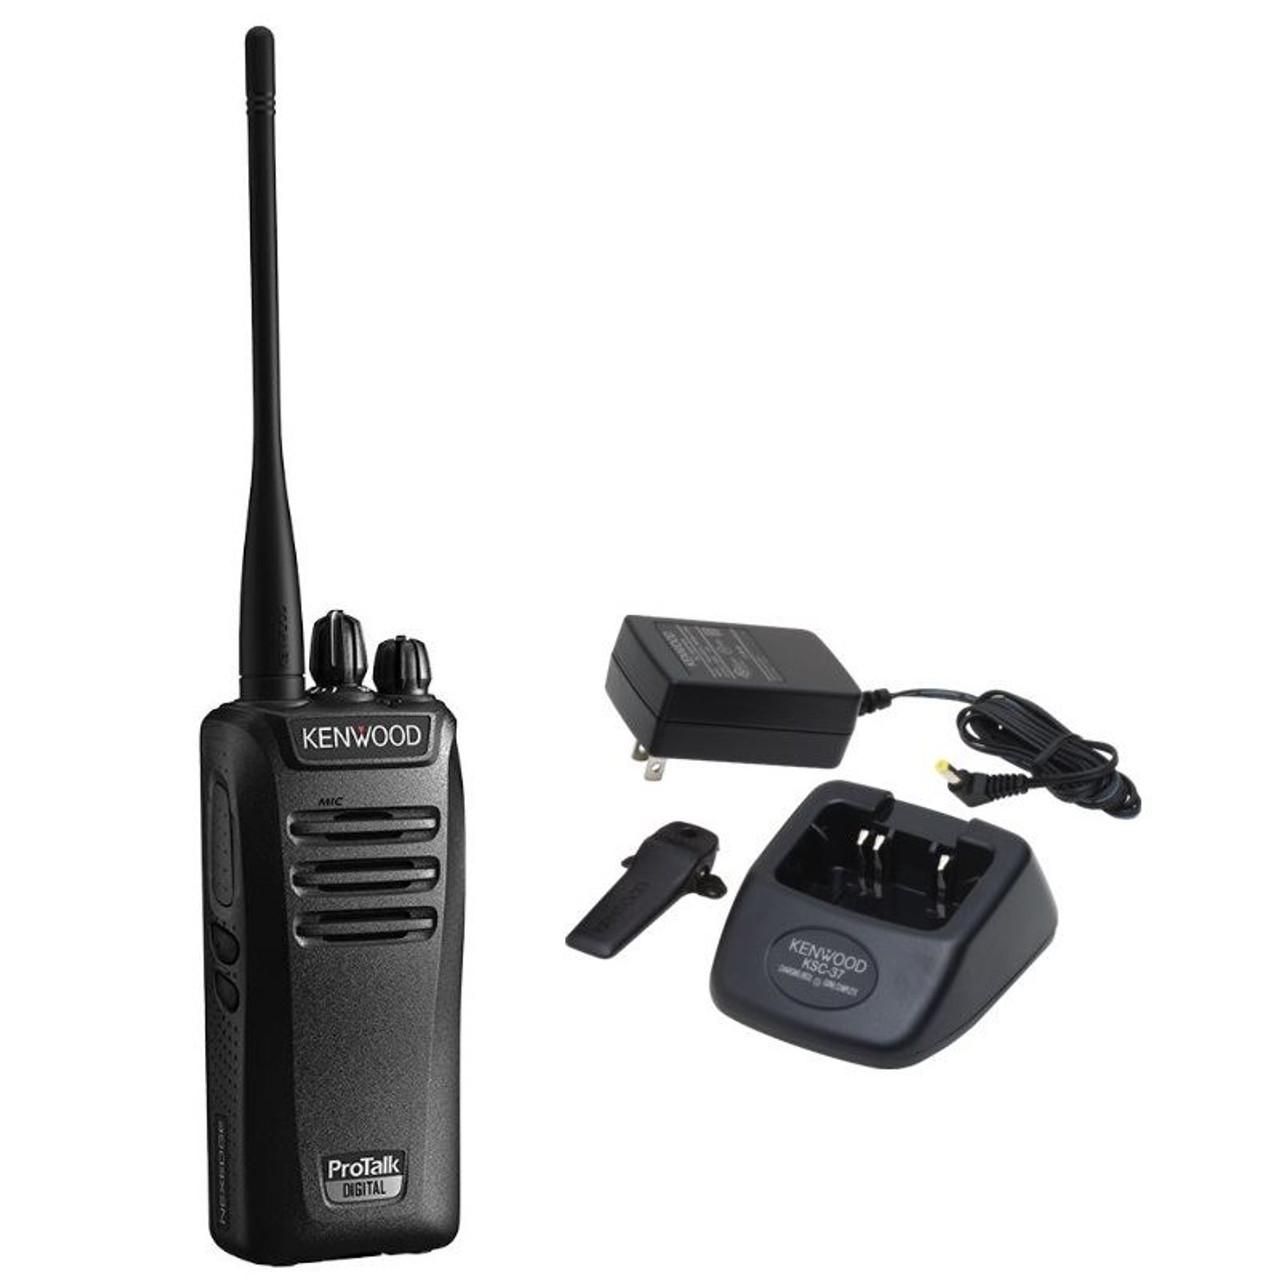 Kenwood NX 340 UHF 5W Digital Analog 32CH Two Way Radio